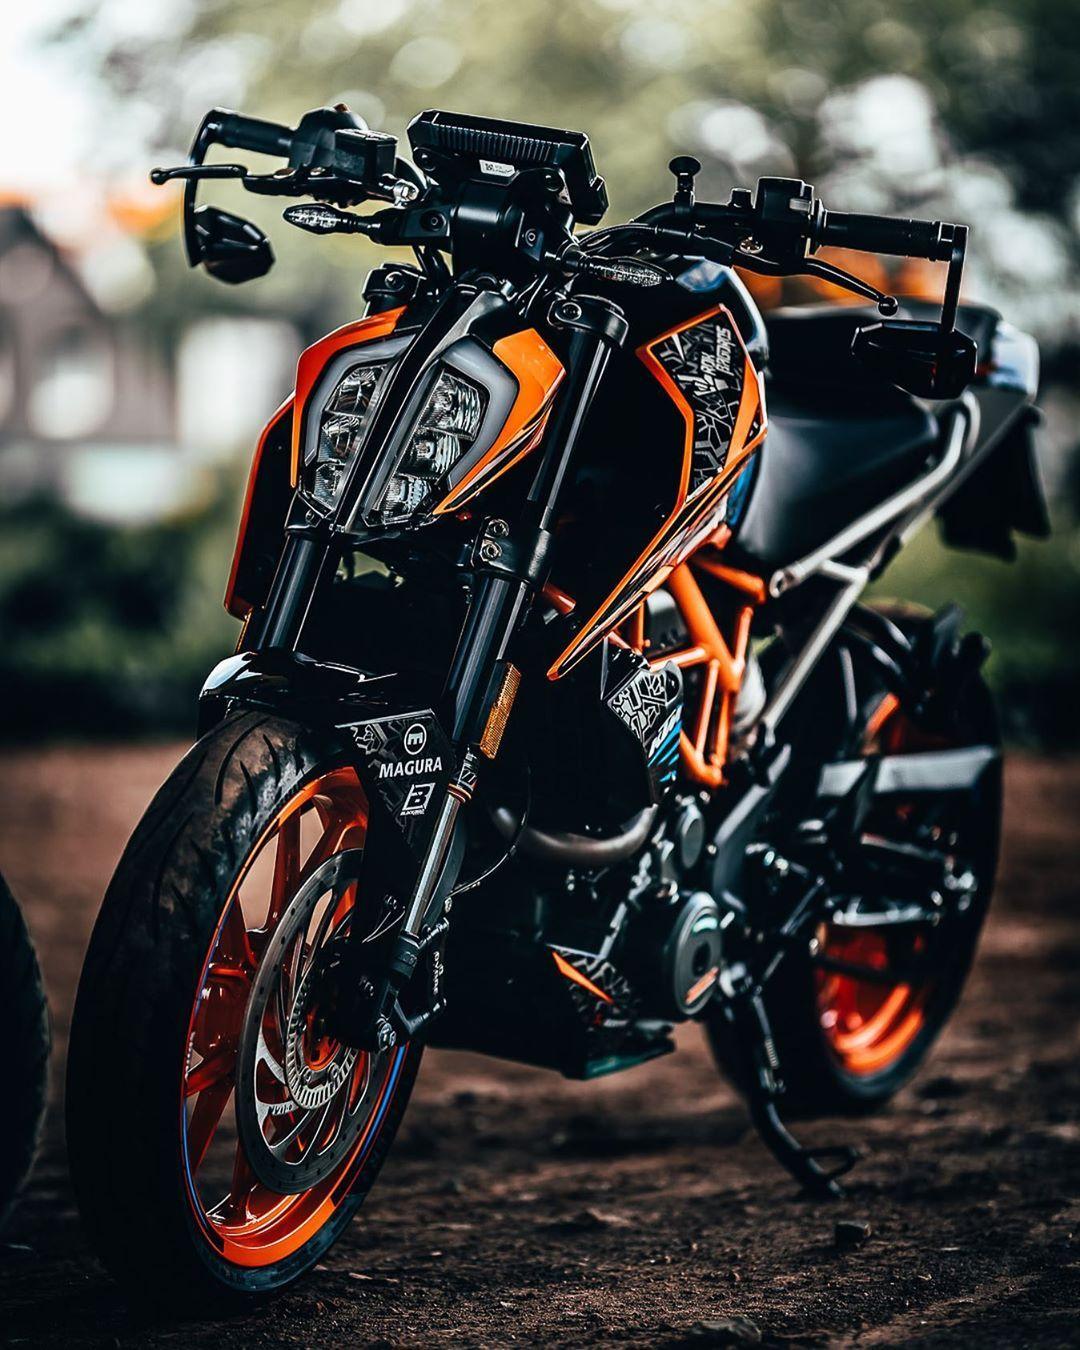 Pin By Naveen Sakanalli On Naveen In 2020 Ktm Motorcycles Ktm